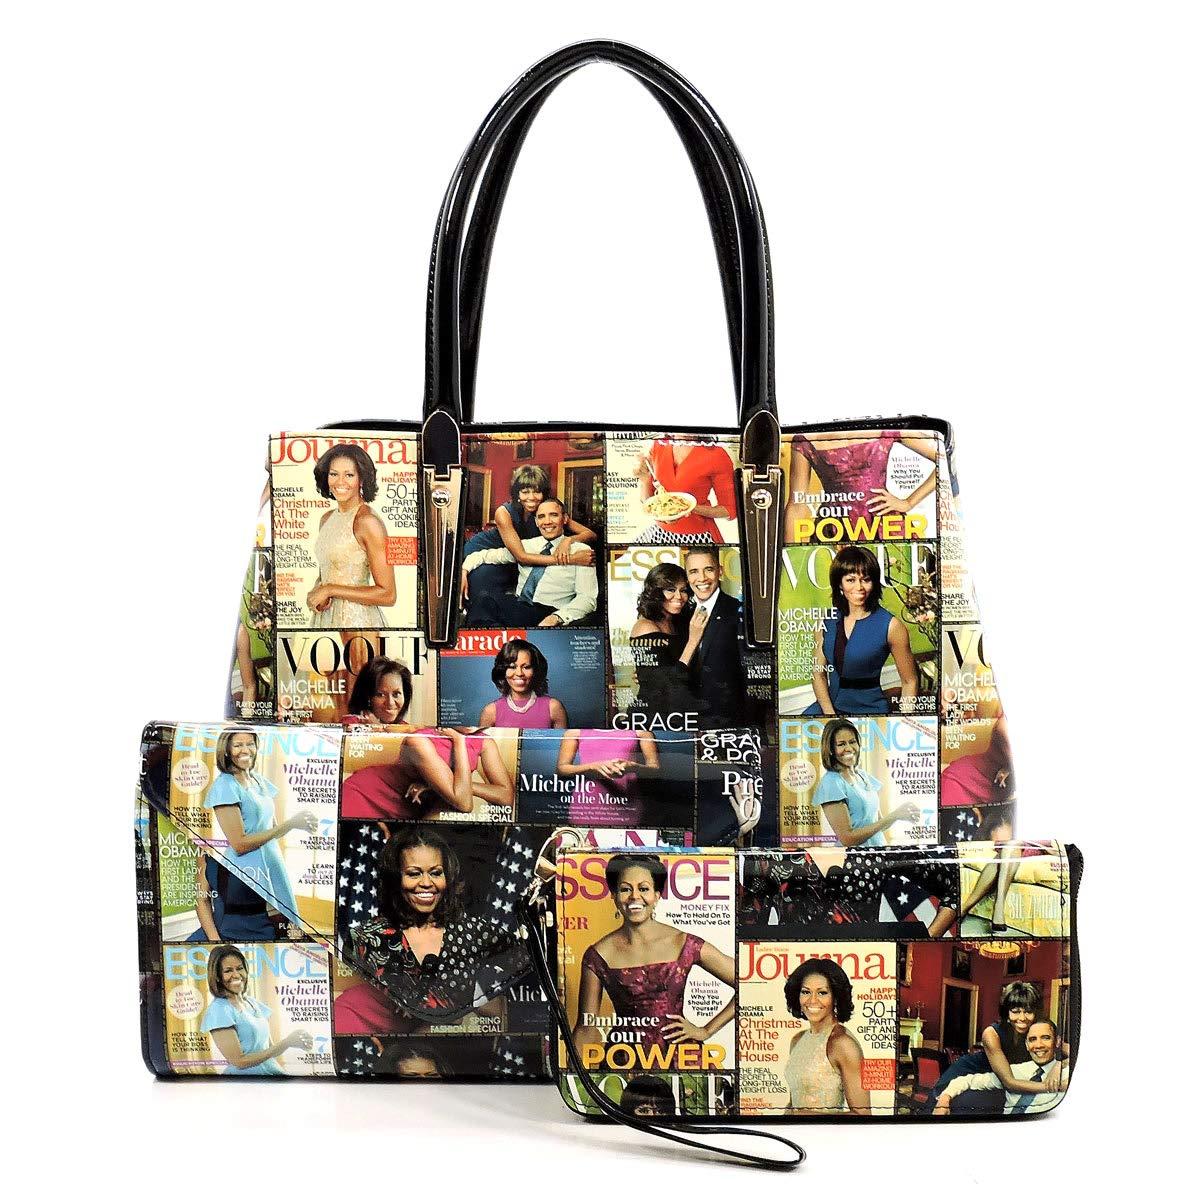 Multi Bk Glossy Magazine Cover Collage Michelle Obama Printed Satchel Bag + Envelope Clutch + Wallet 3pcs set